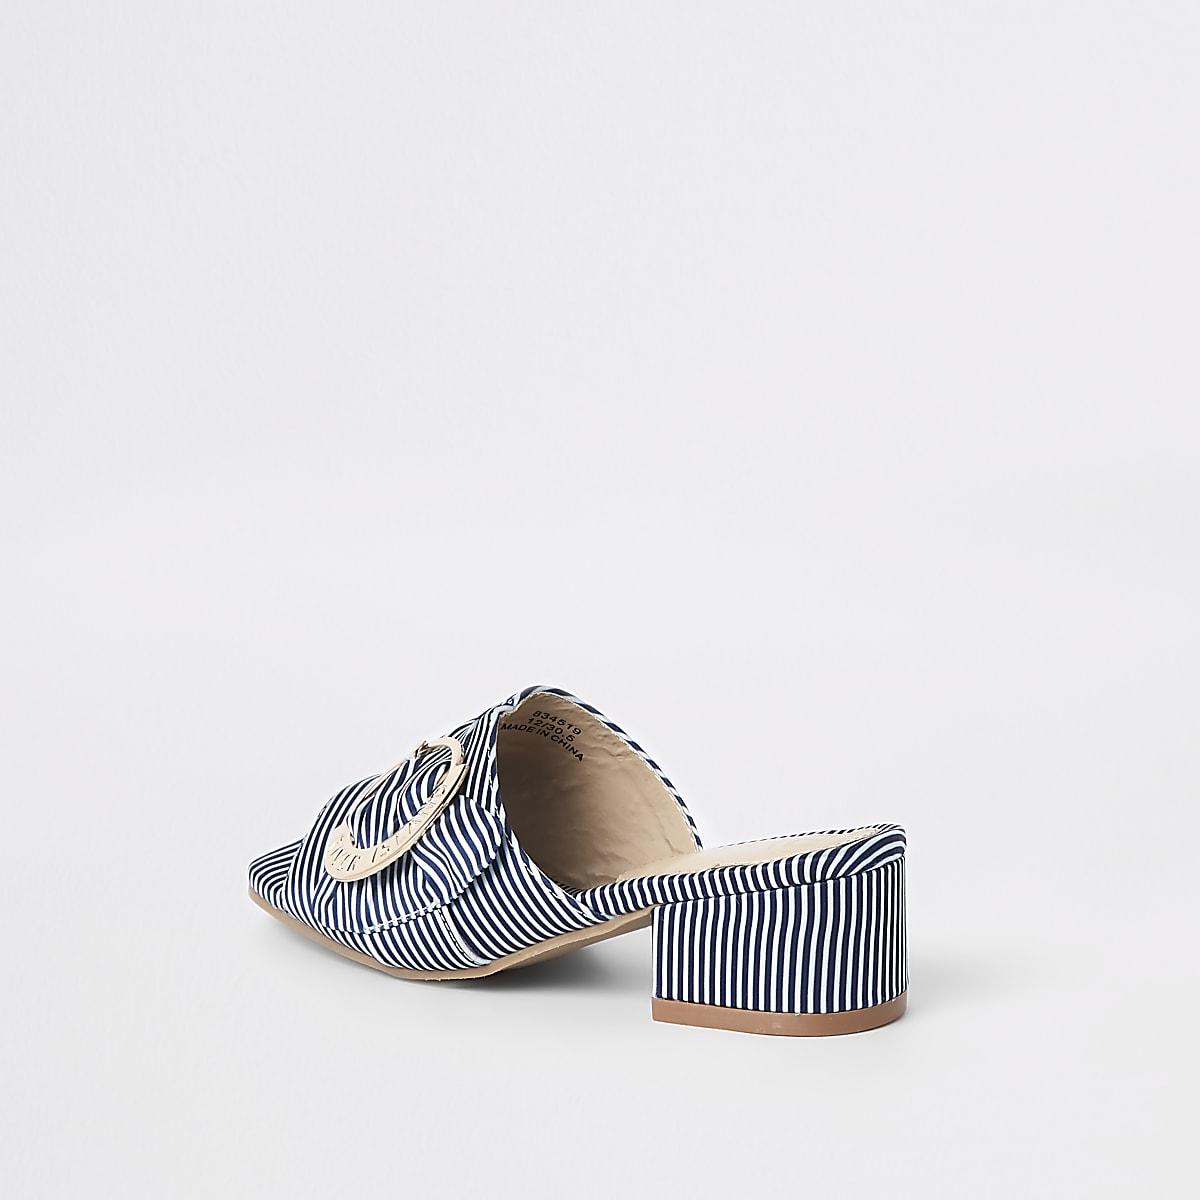 84bd3a4857 Girls navy buckle heel mule sandals - Shoes - Footwear - girls